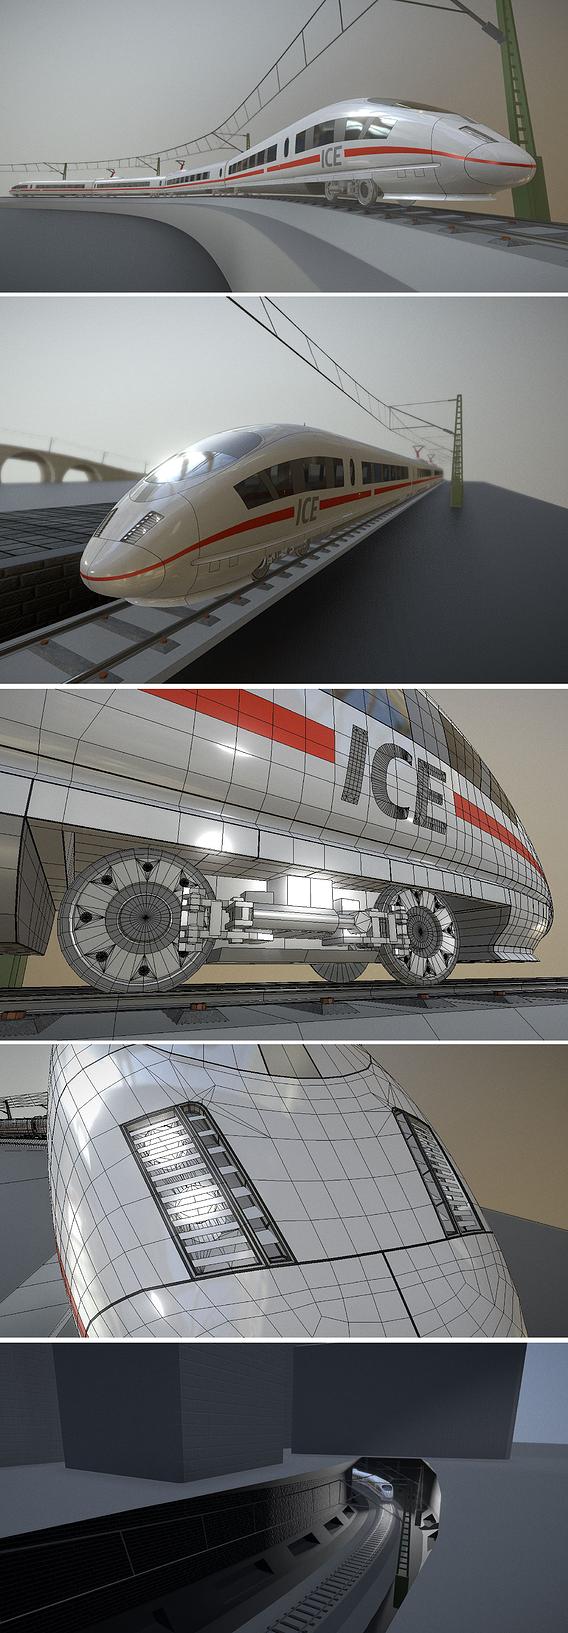 ICE 3 Bullet Train